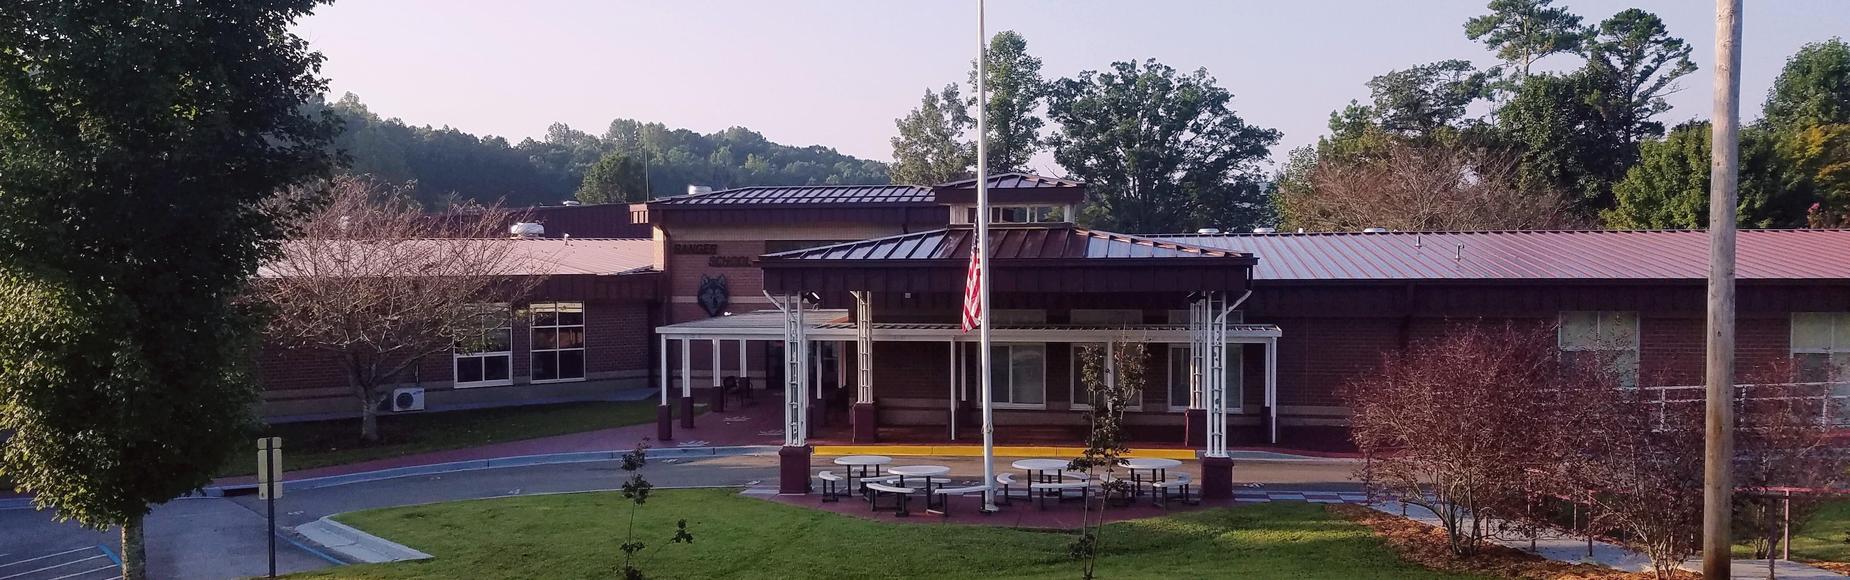 Ranger Elementary School